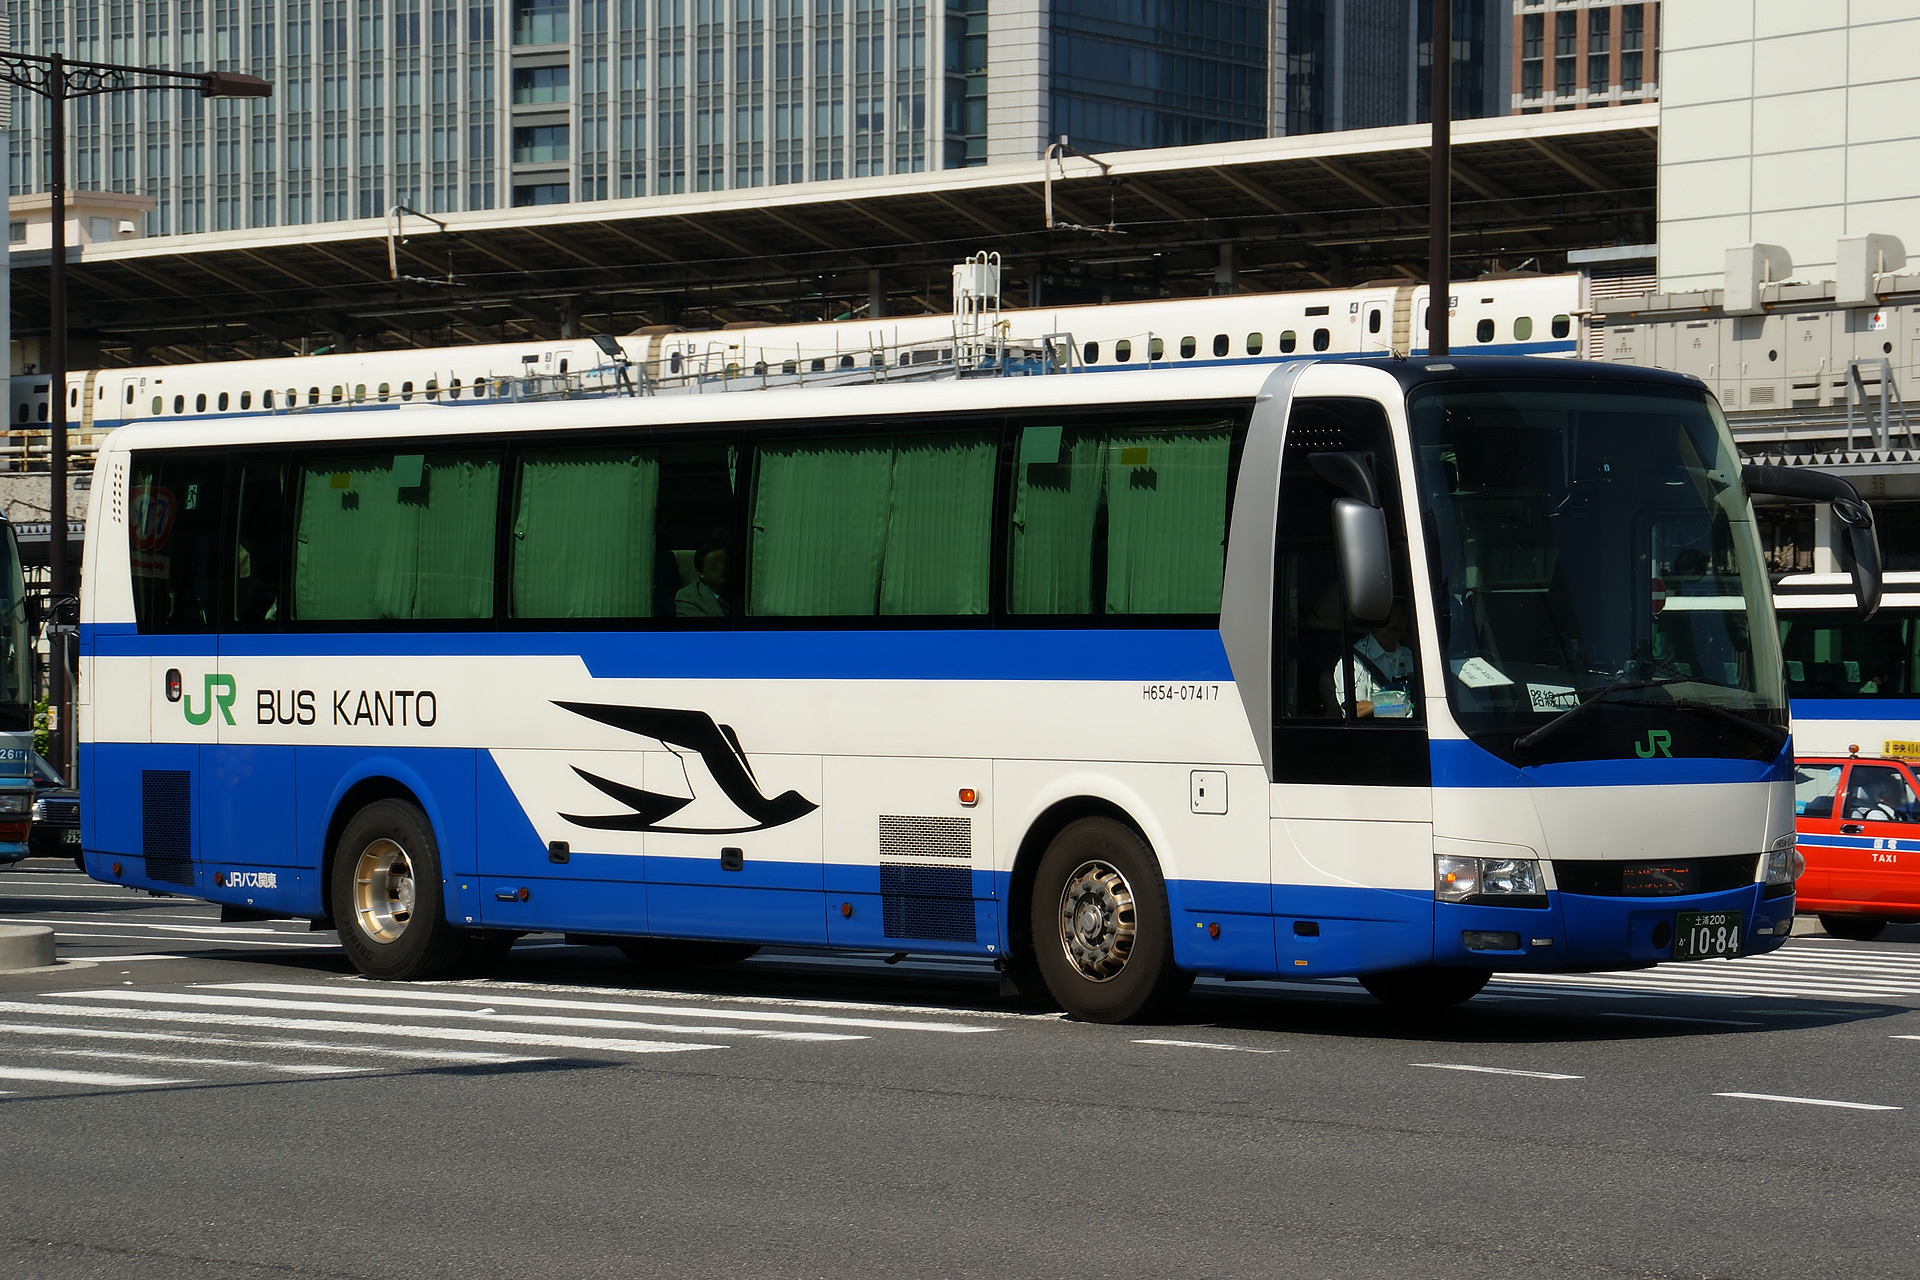 FileJR Bus Kanto